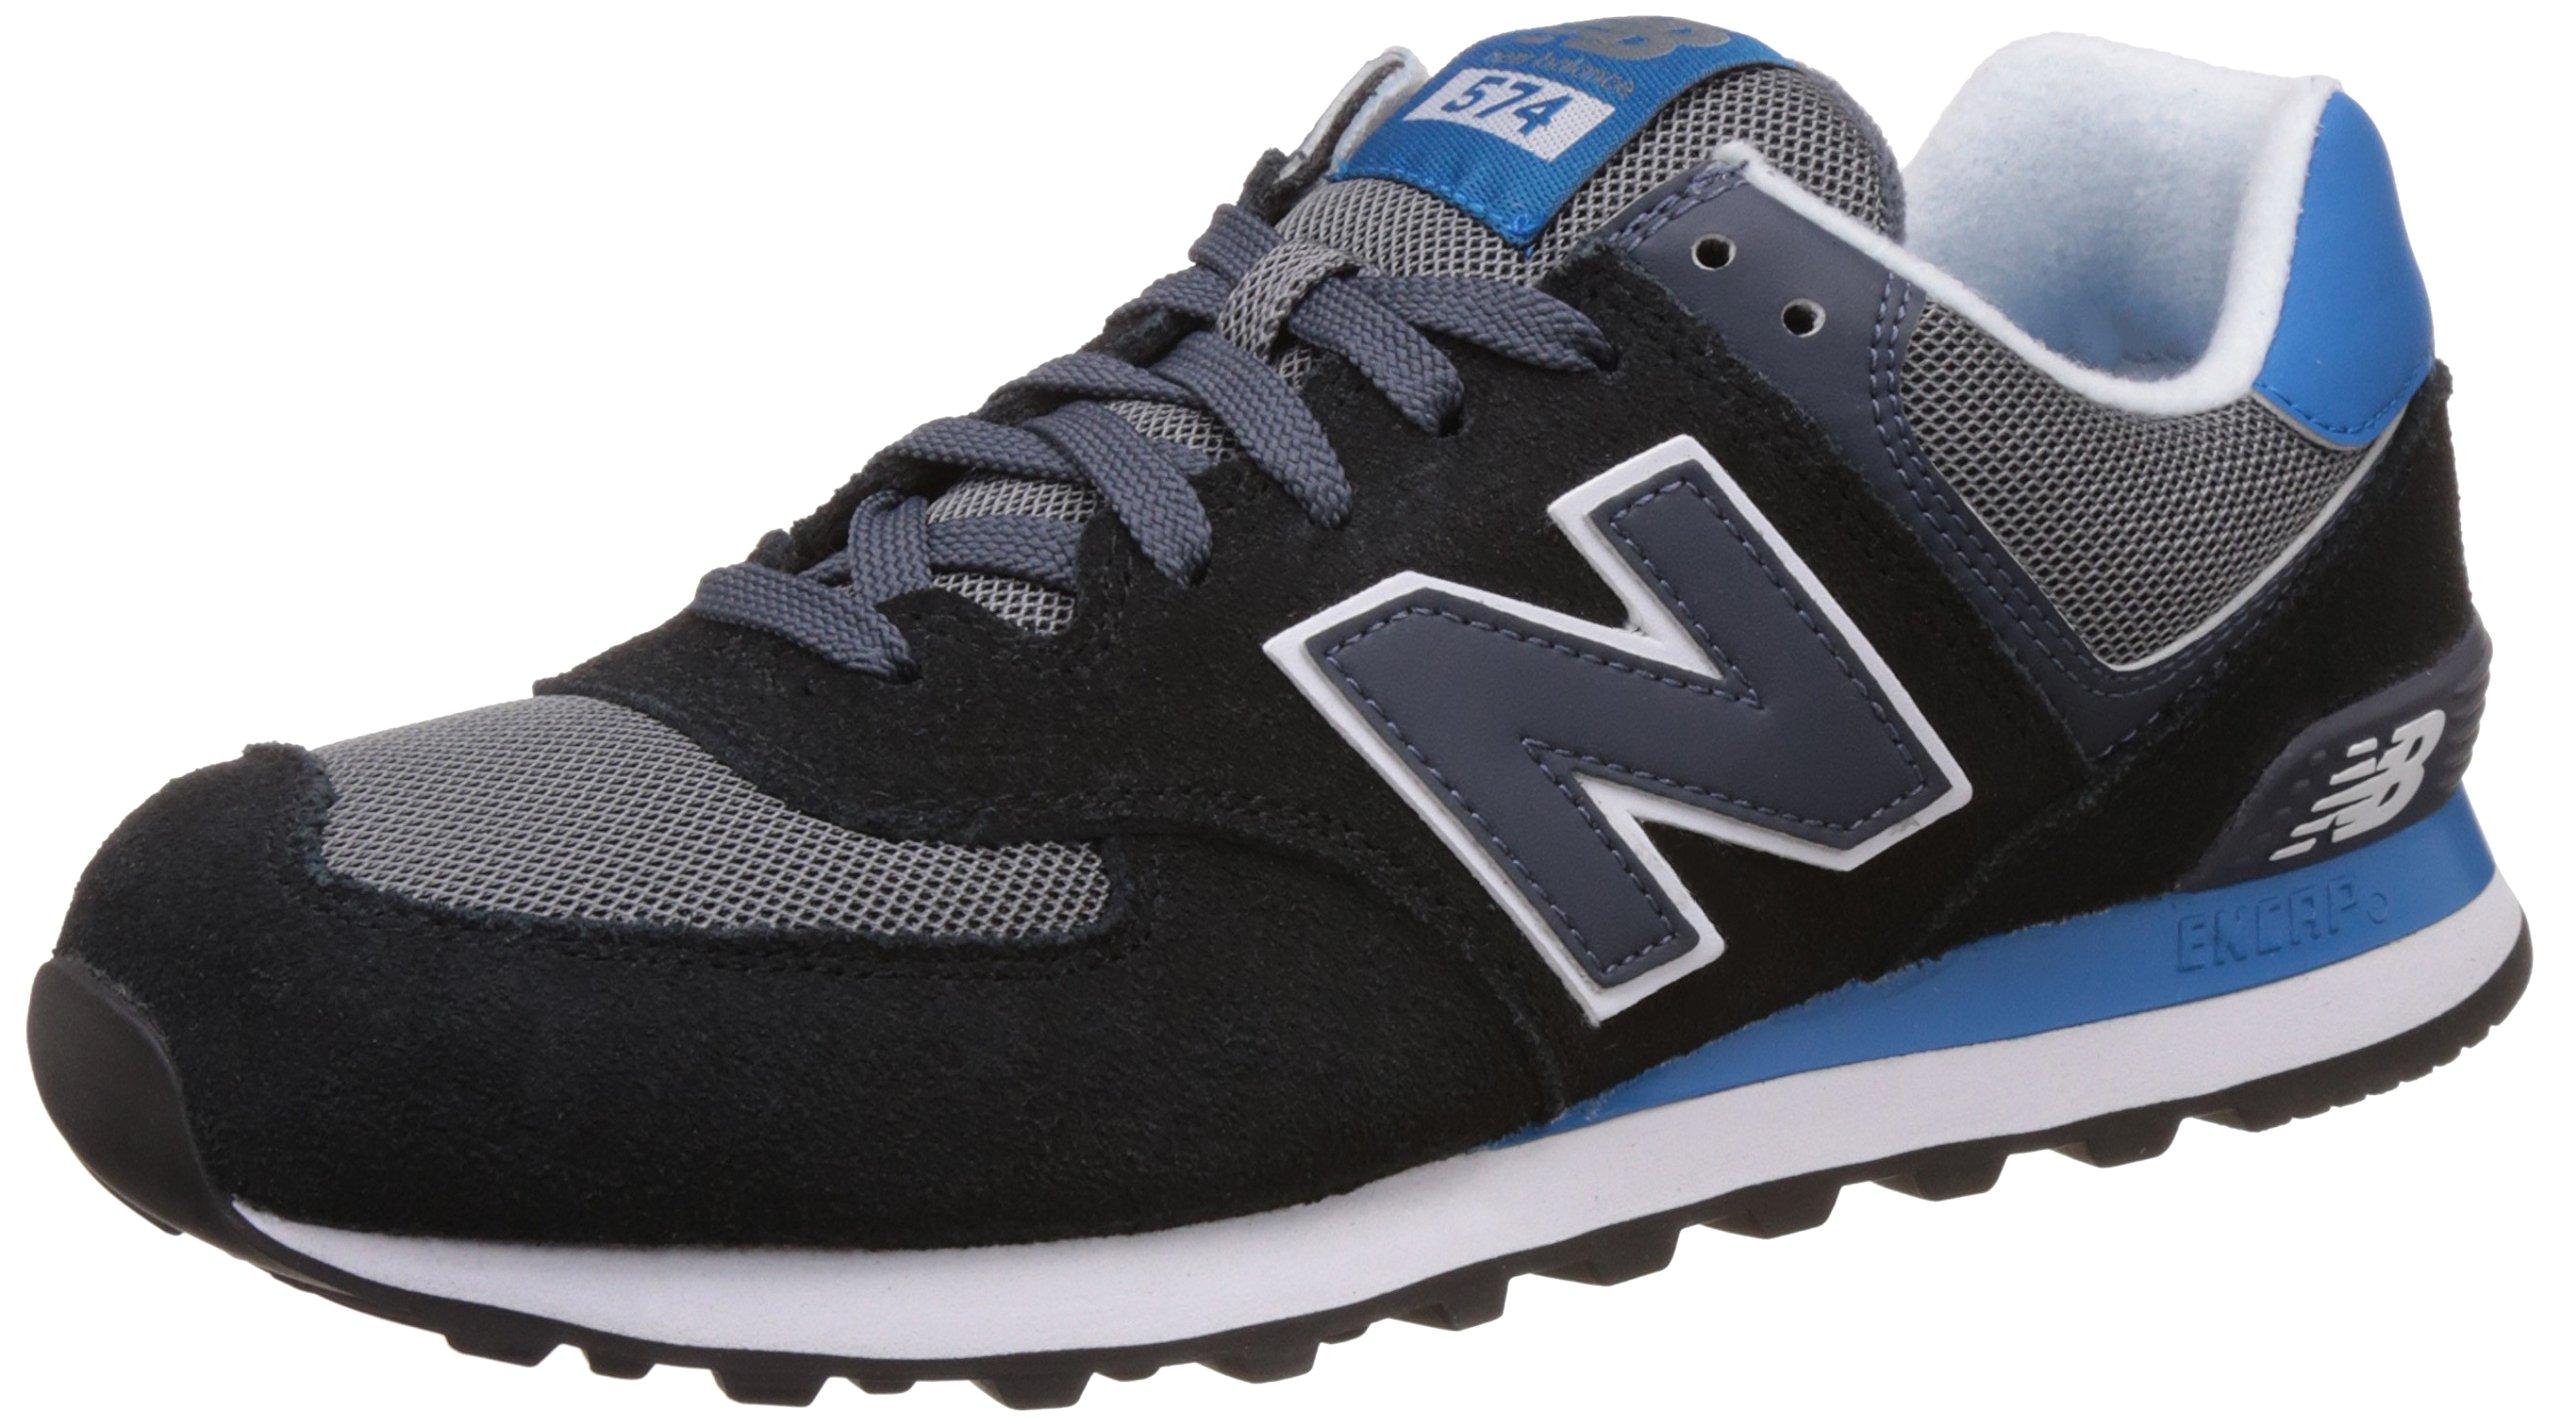 Galleon - New Balance Menu0026#39;s ML574 Core Plus Fashion Sneakers Black/Grey 11 2E US